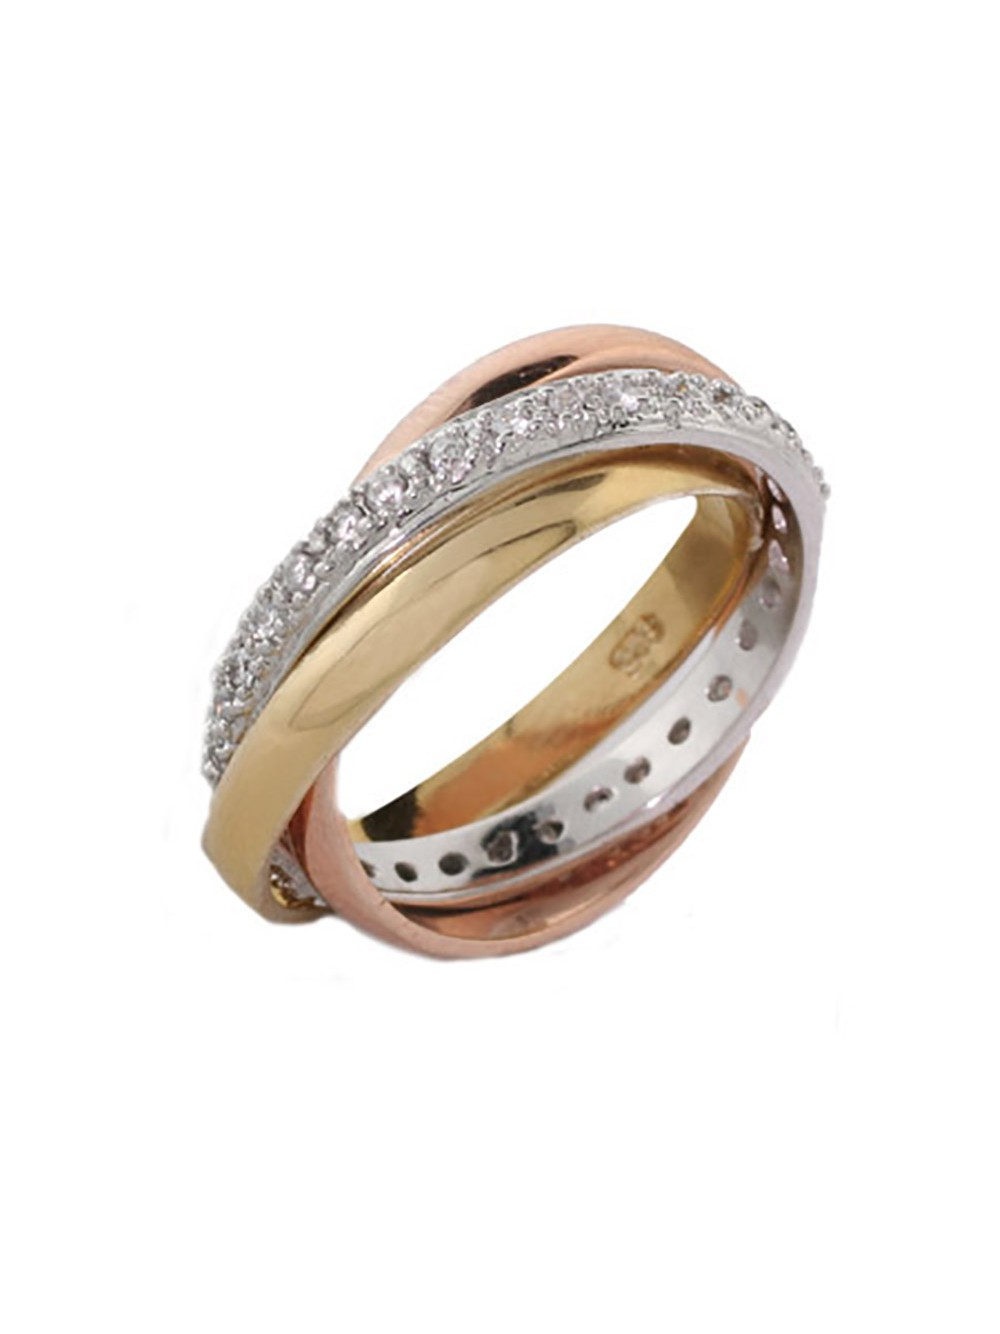 Russian Silver Wedding Three Band Ring